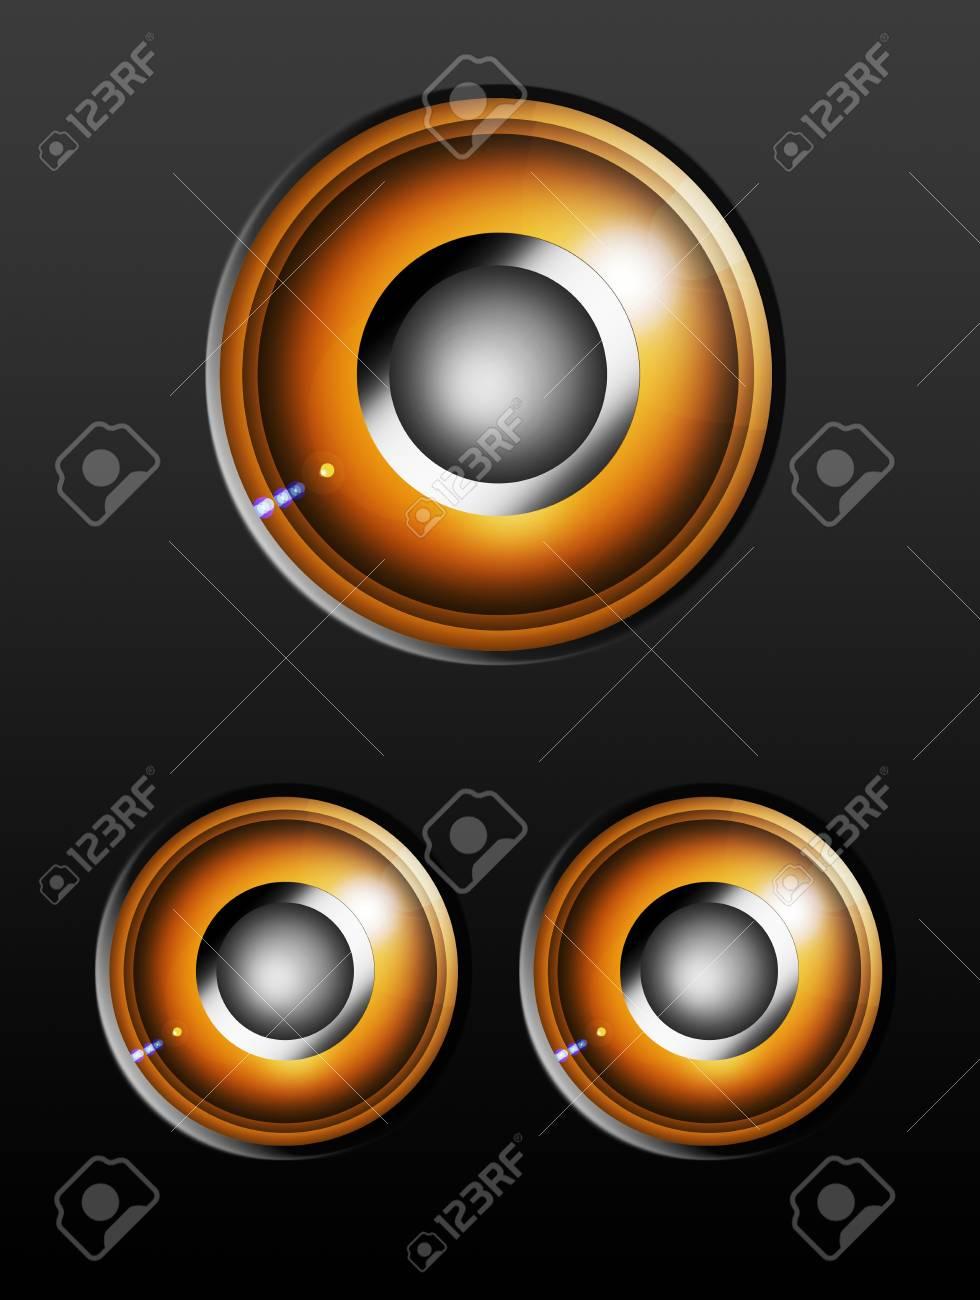 Three round orange speakers over gray background Stock Photo - 9693820